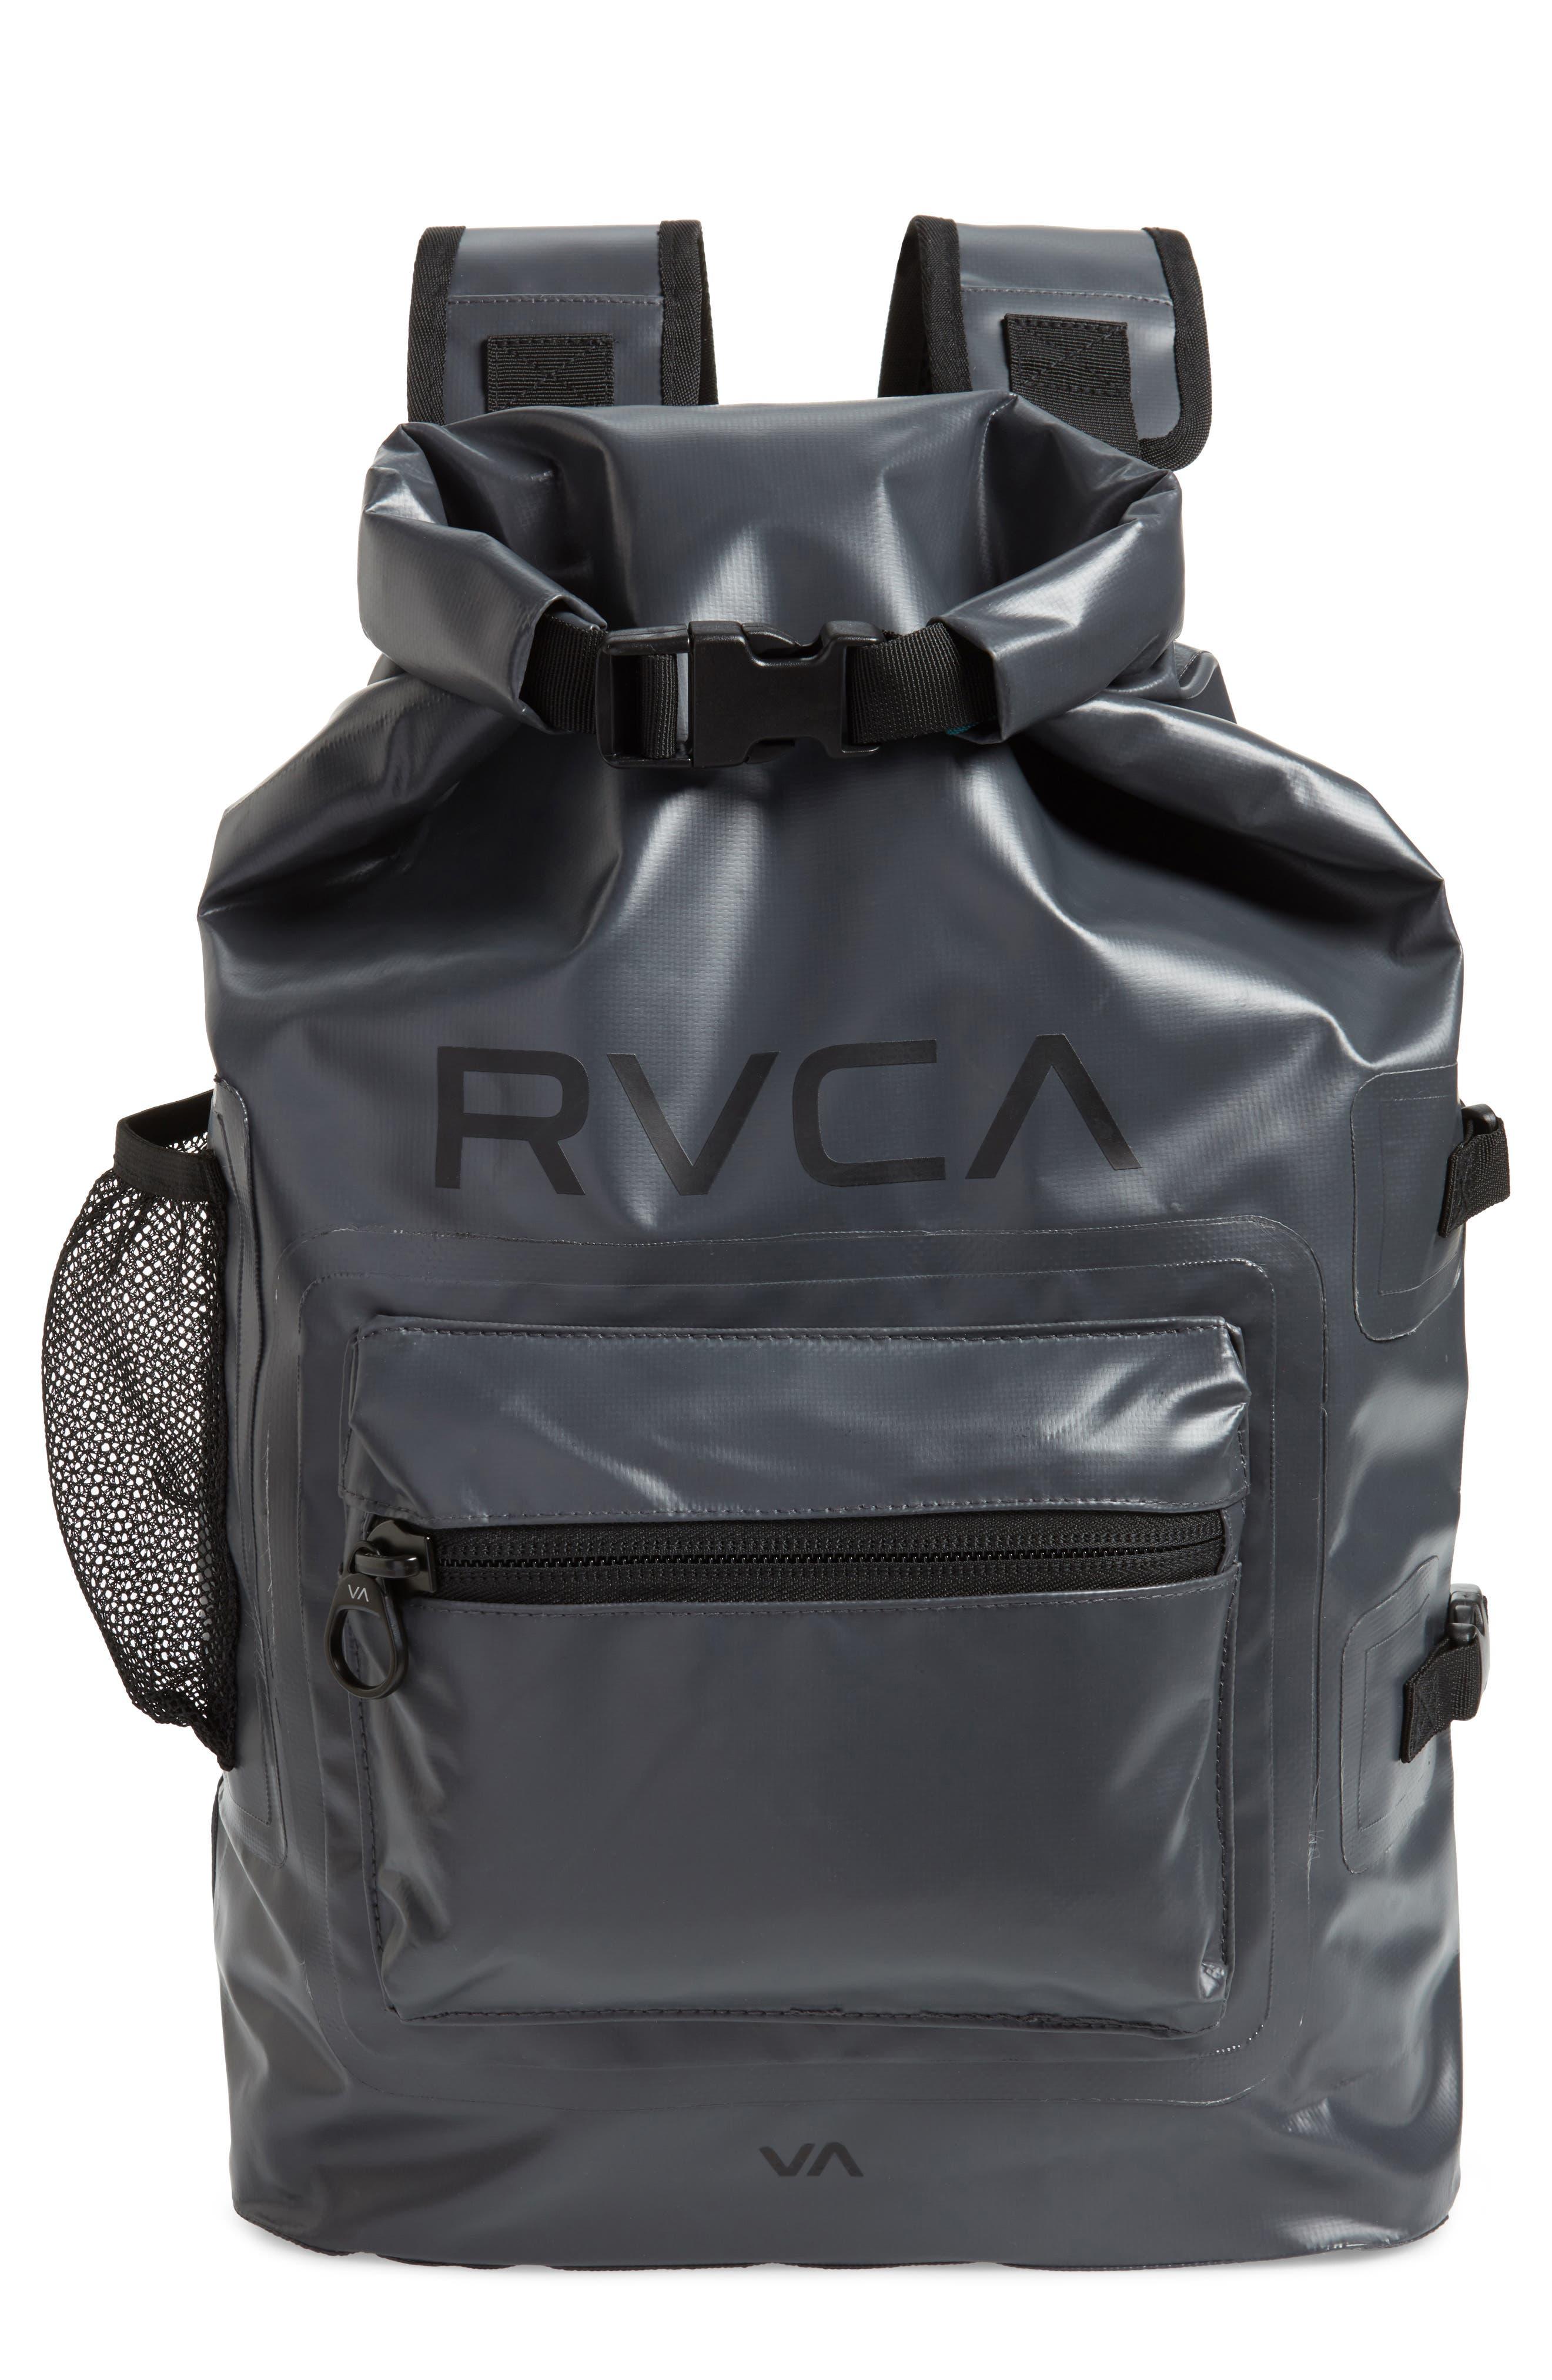 Go Be II Waterproof Backpack,                         Main,                         color, Charcoal